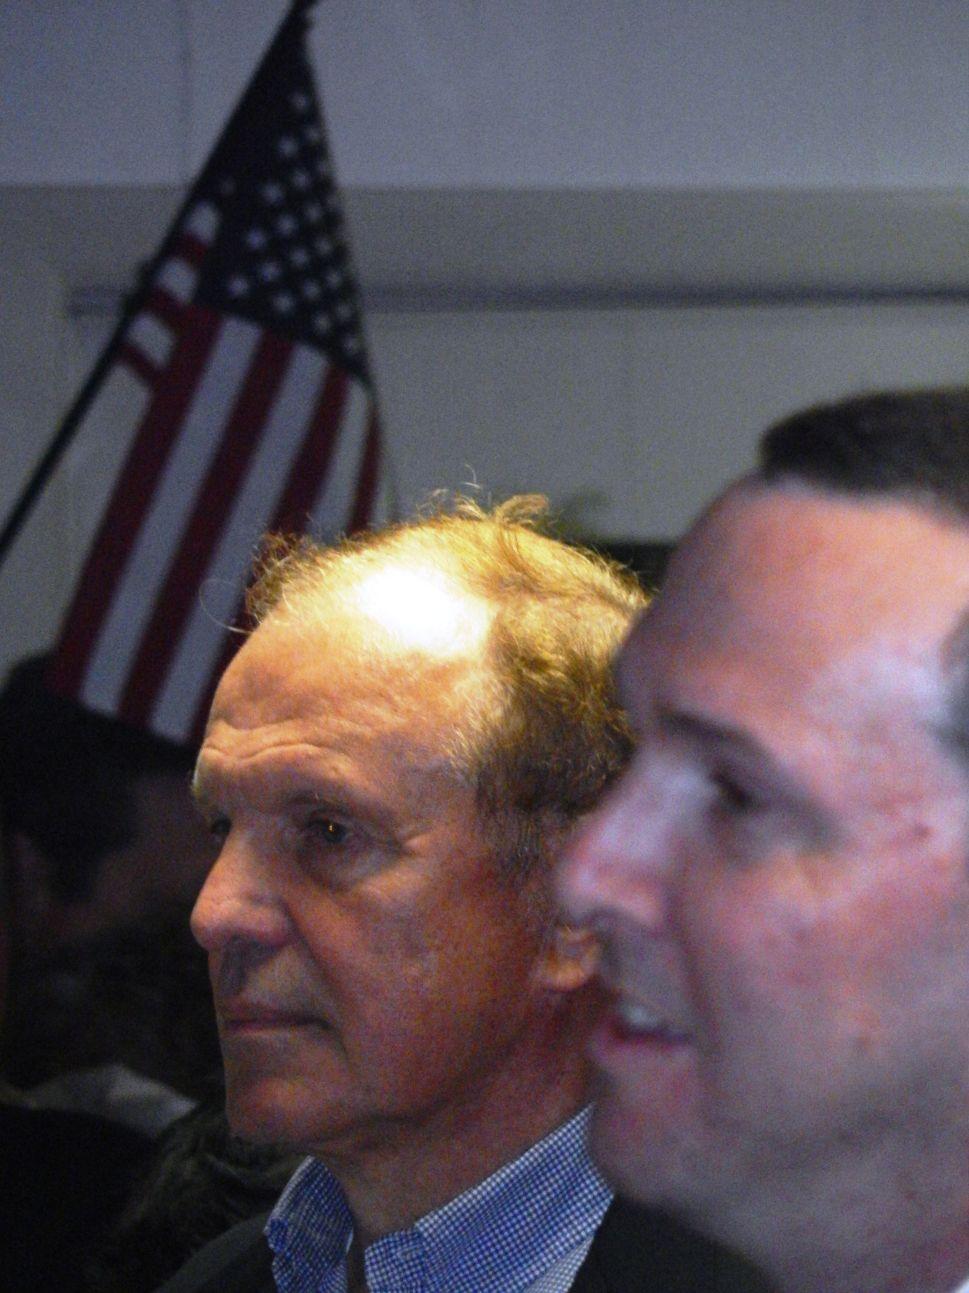 Lesniak: If offered the senate presidency, 'I would decline'